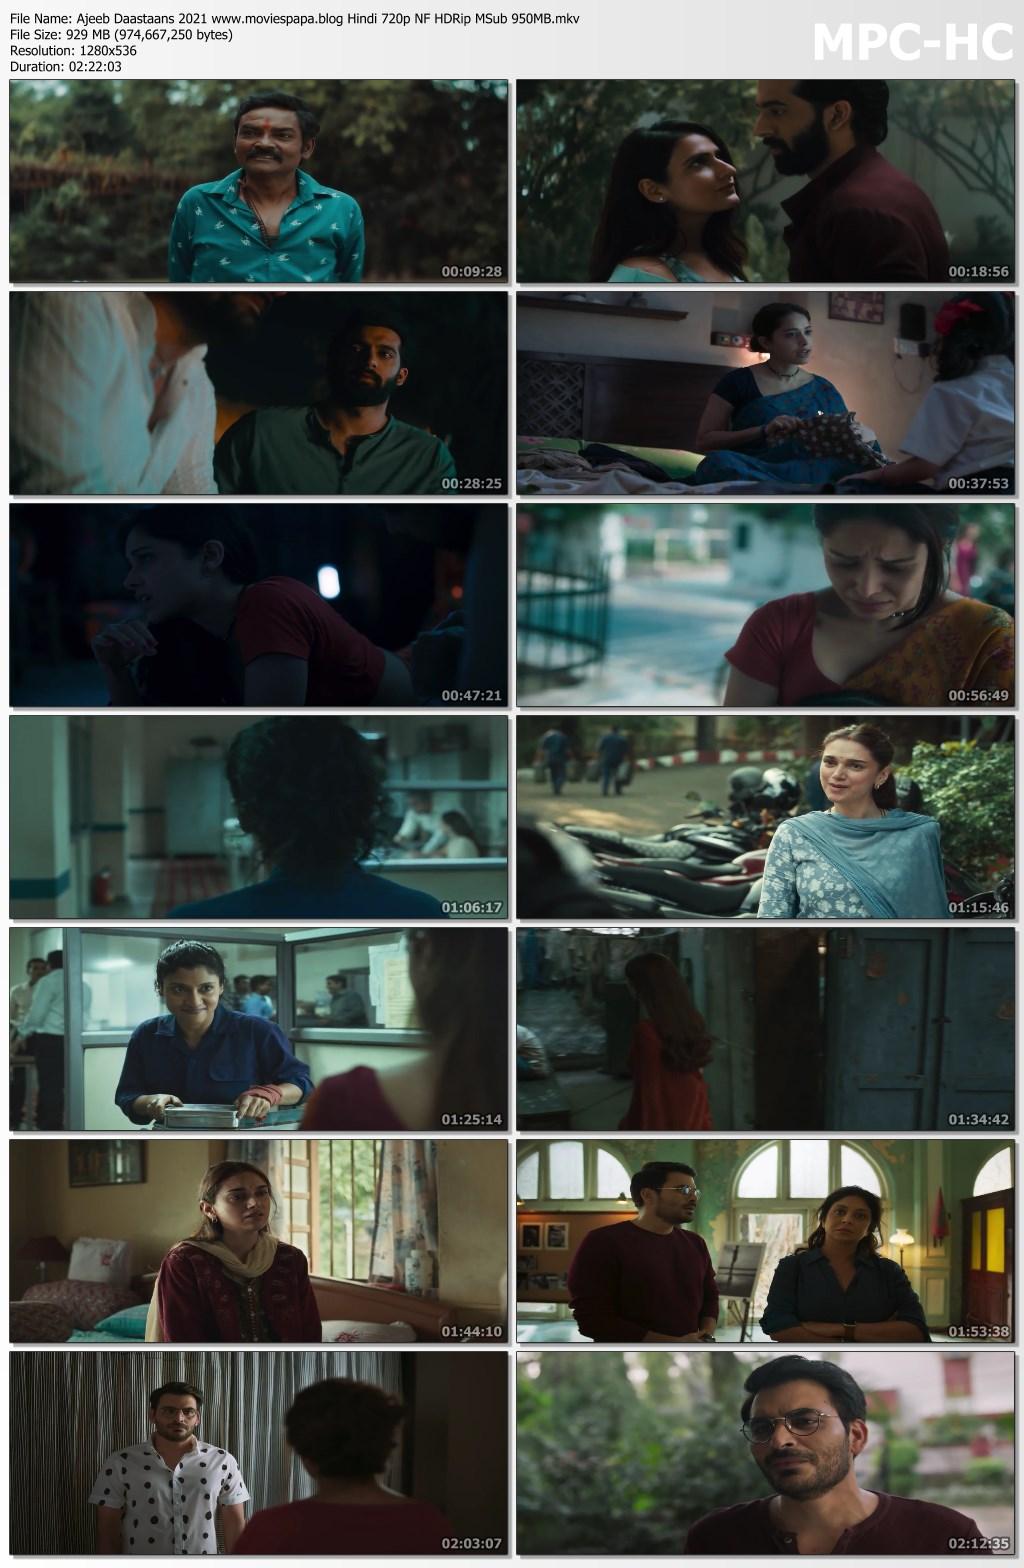 Ajeeb Daastaans 2021 screenshot HDMoviesFair